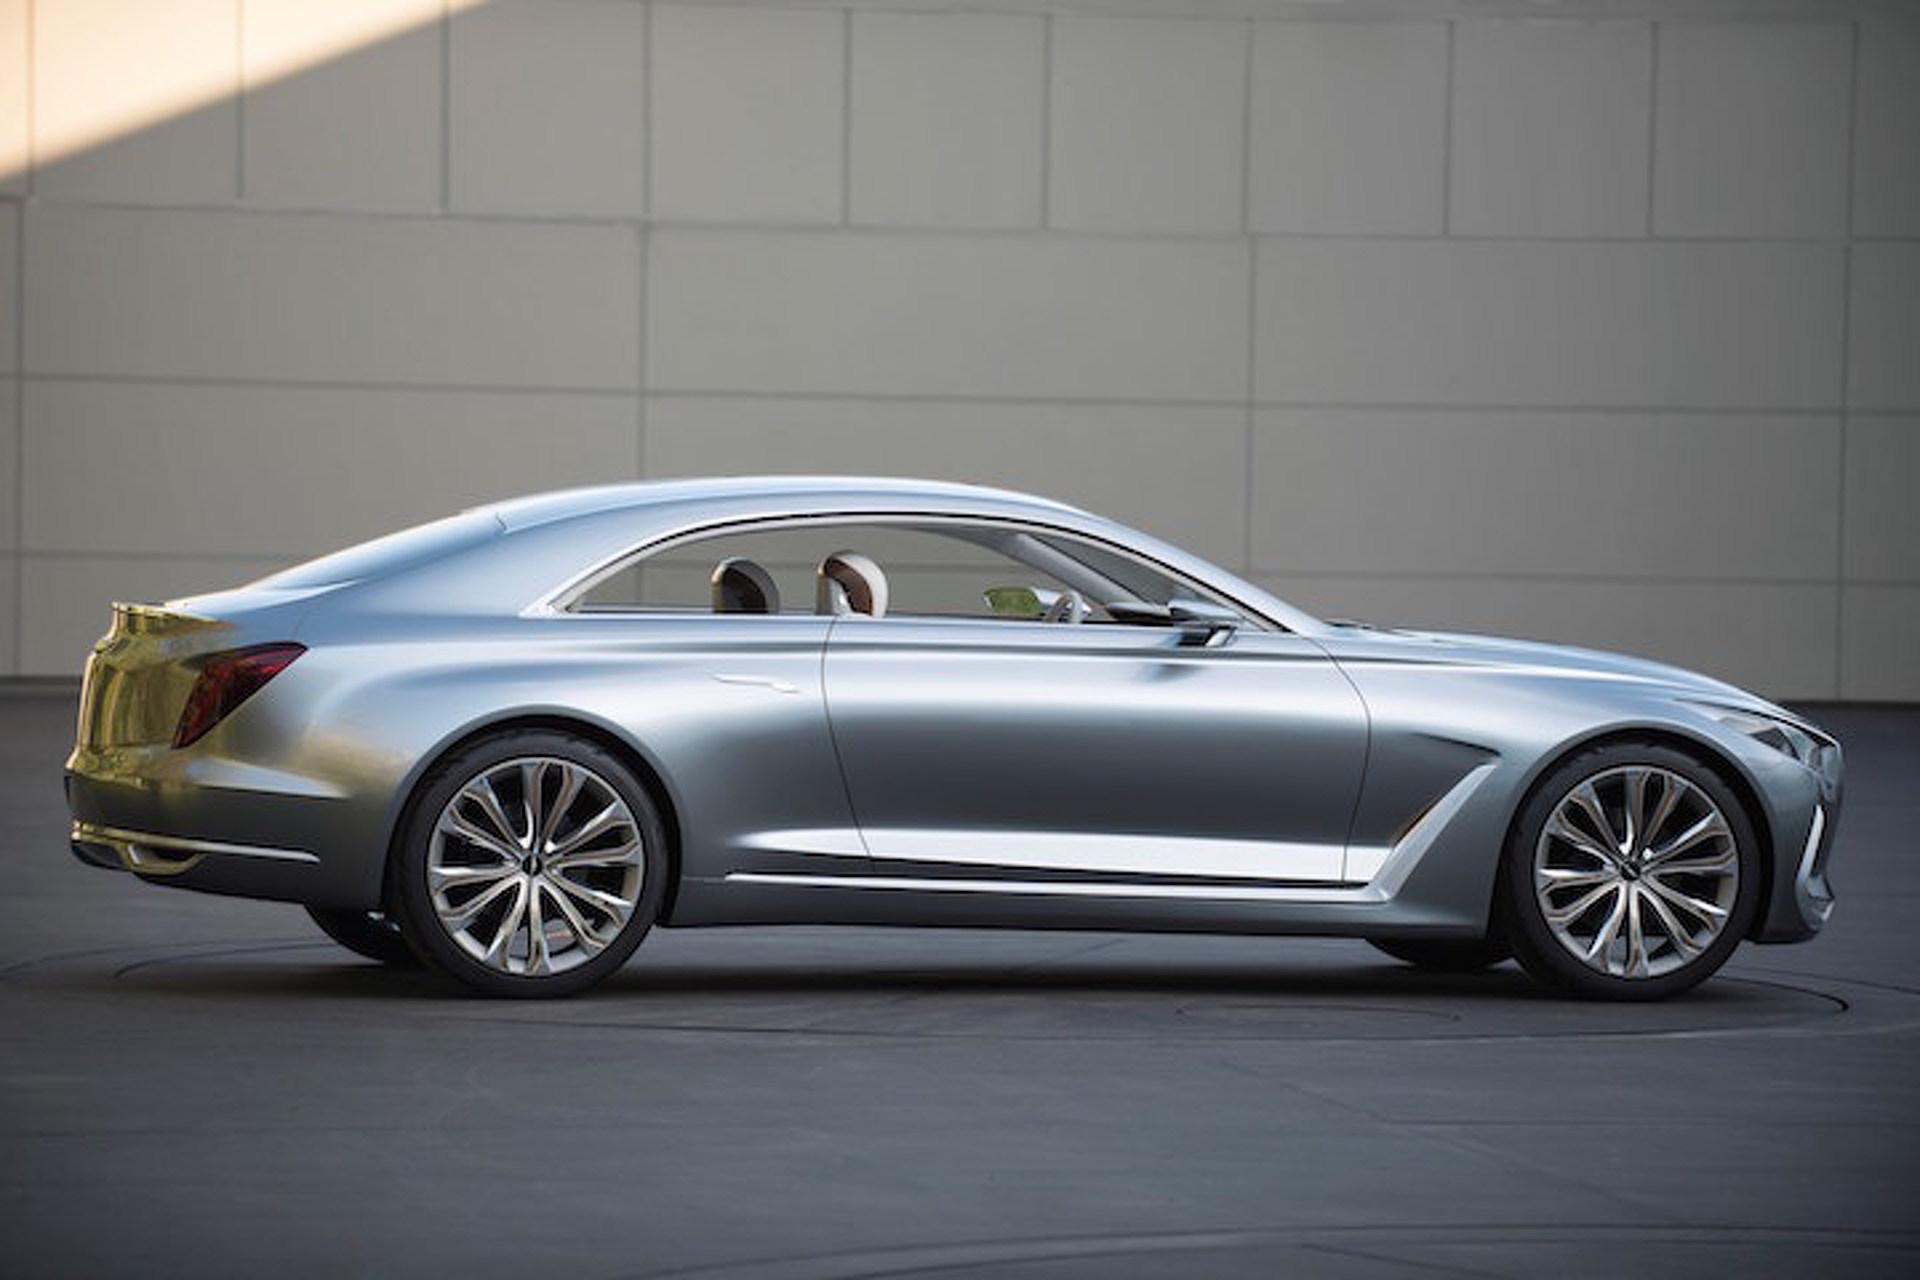 Hyundai Vision G Concept Previews a Pretty Future for the Genesis